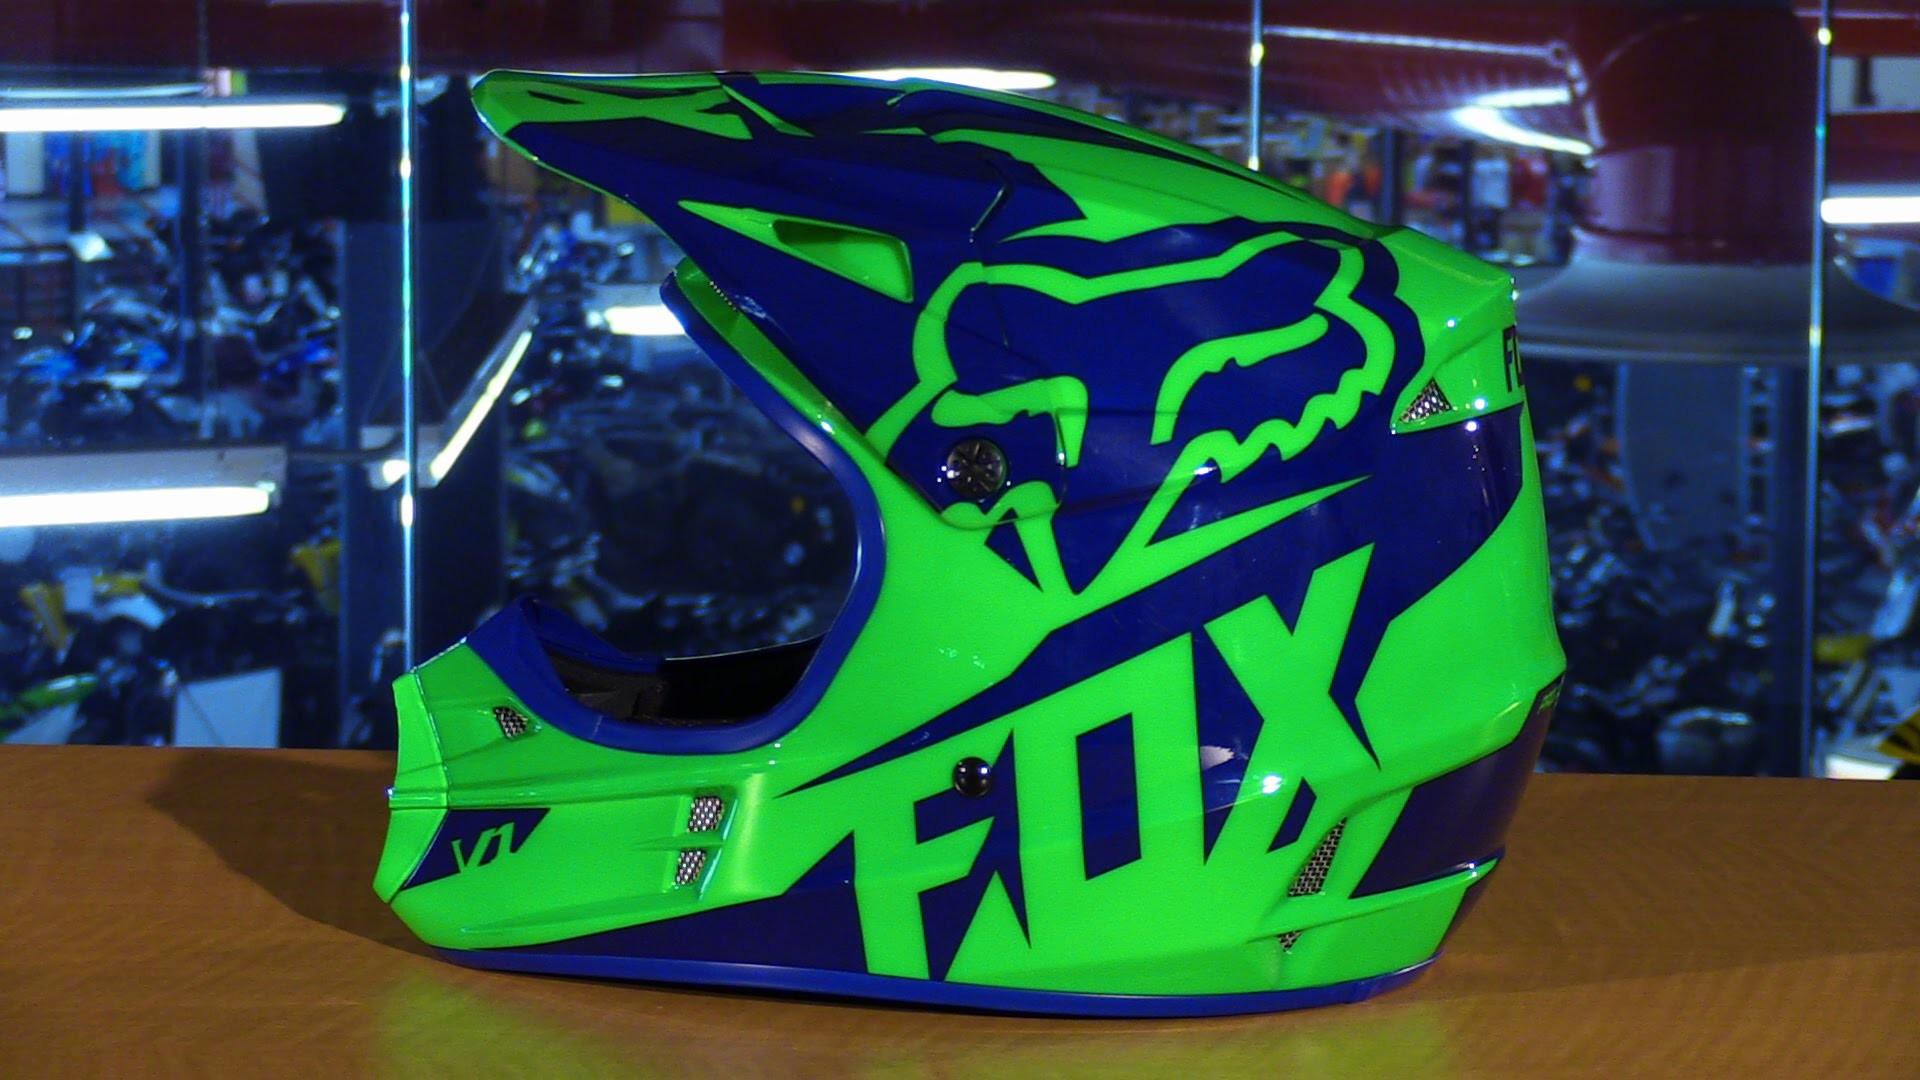 Fox racing | WALLPAPERS IPHONE 7, IPHONE 7 PLUS, iPhone 6 plus .